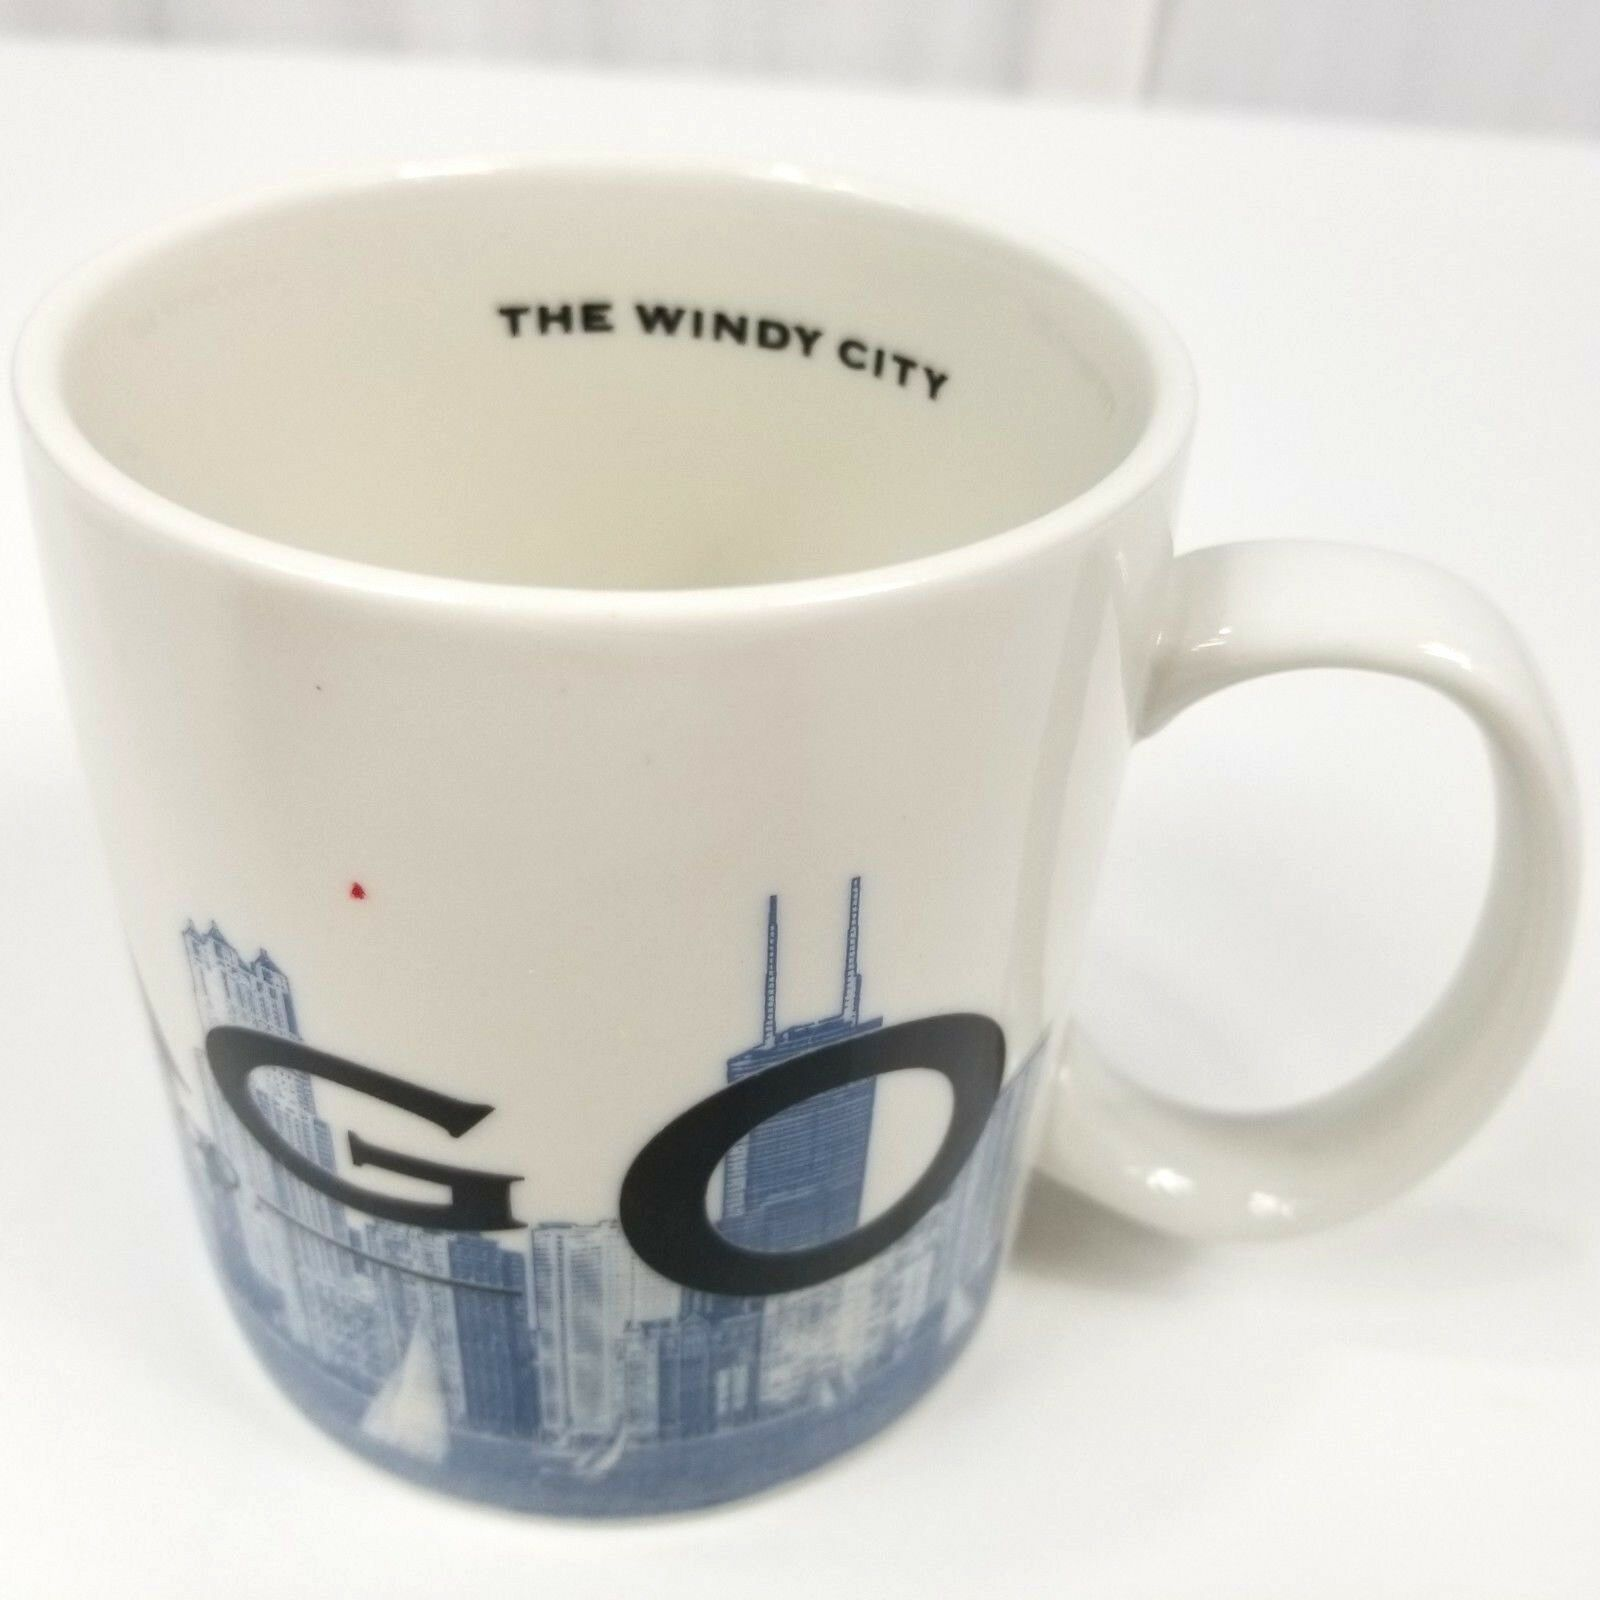 Starbucks Chicago Skyline Series Mug Coffee Cup Tea Large Windy City Barista